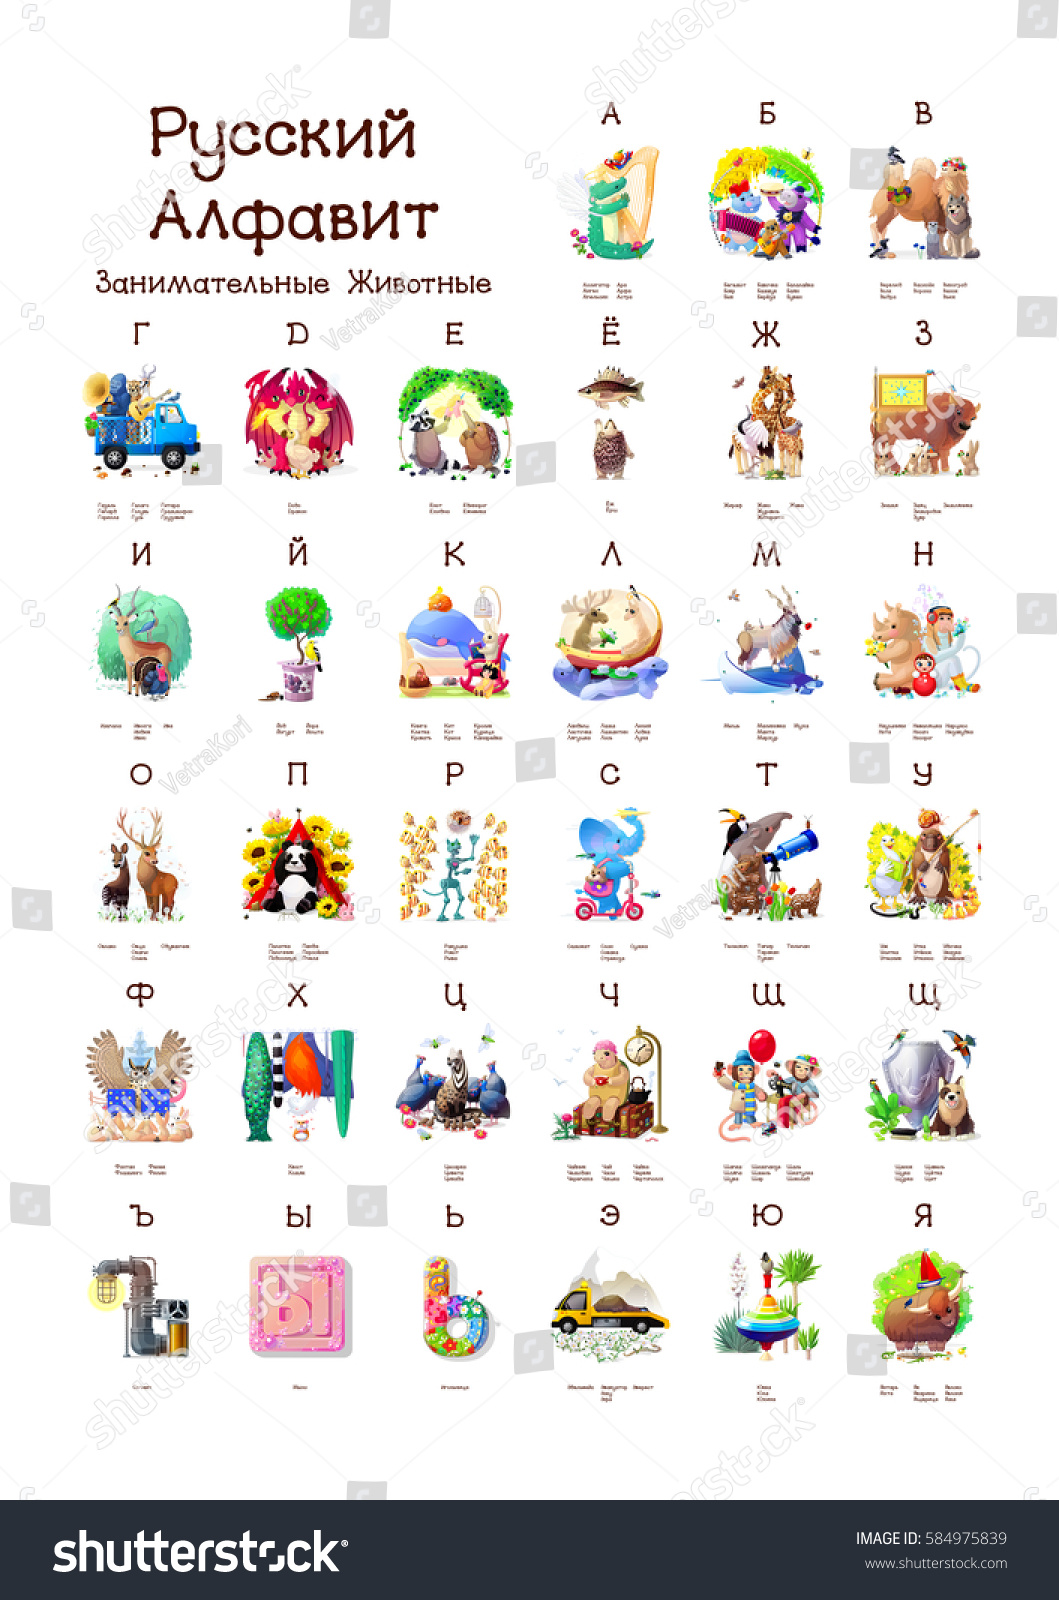 Russian Alphabet Cyrillic Slavic Language Series Stock Illustration